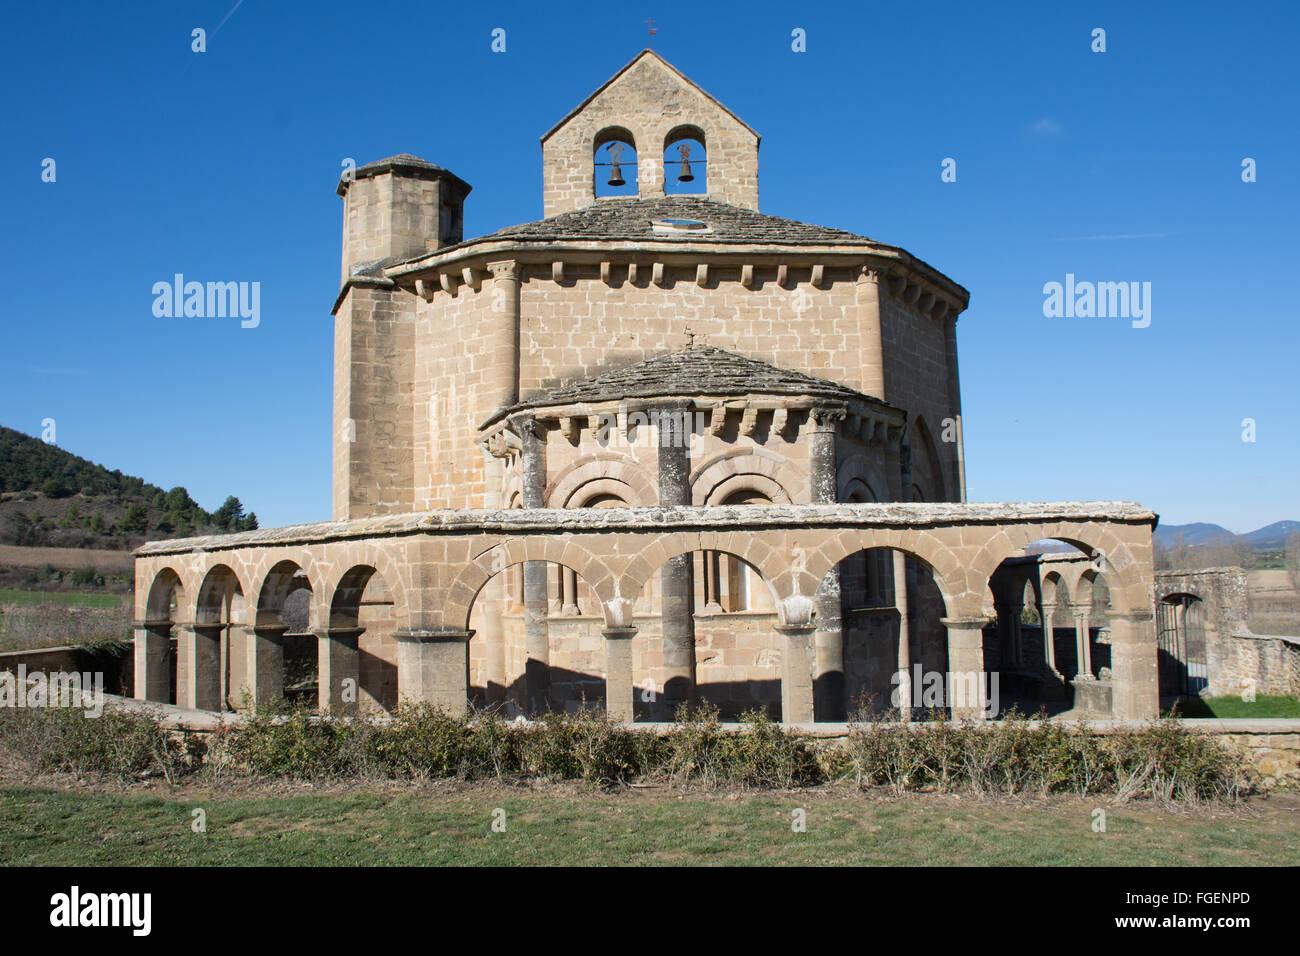 Eunate chapel Spain - Stock Image